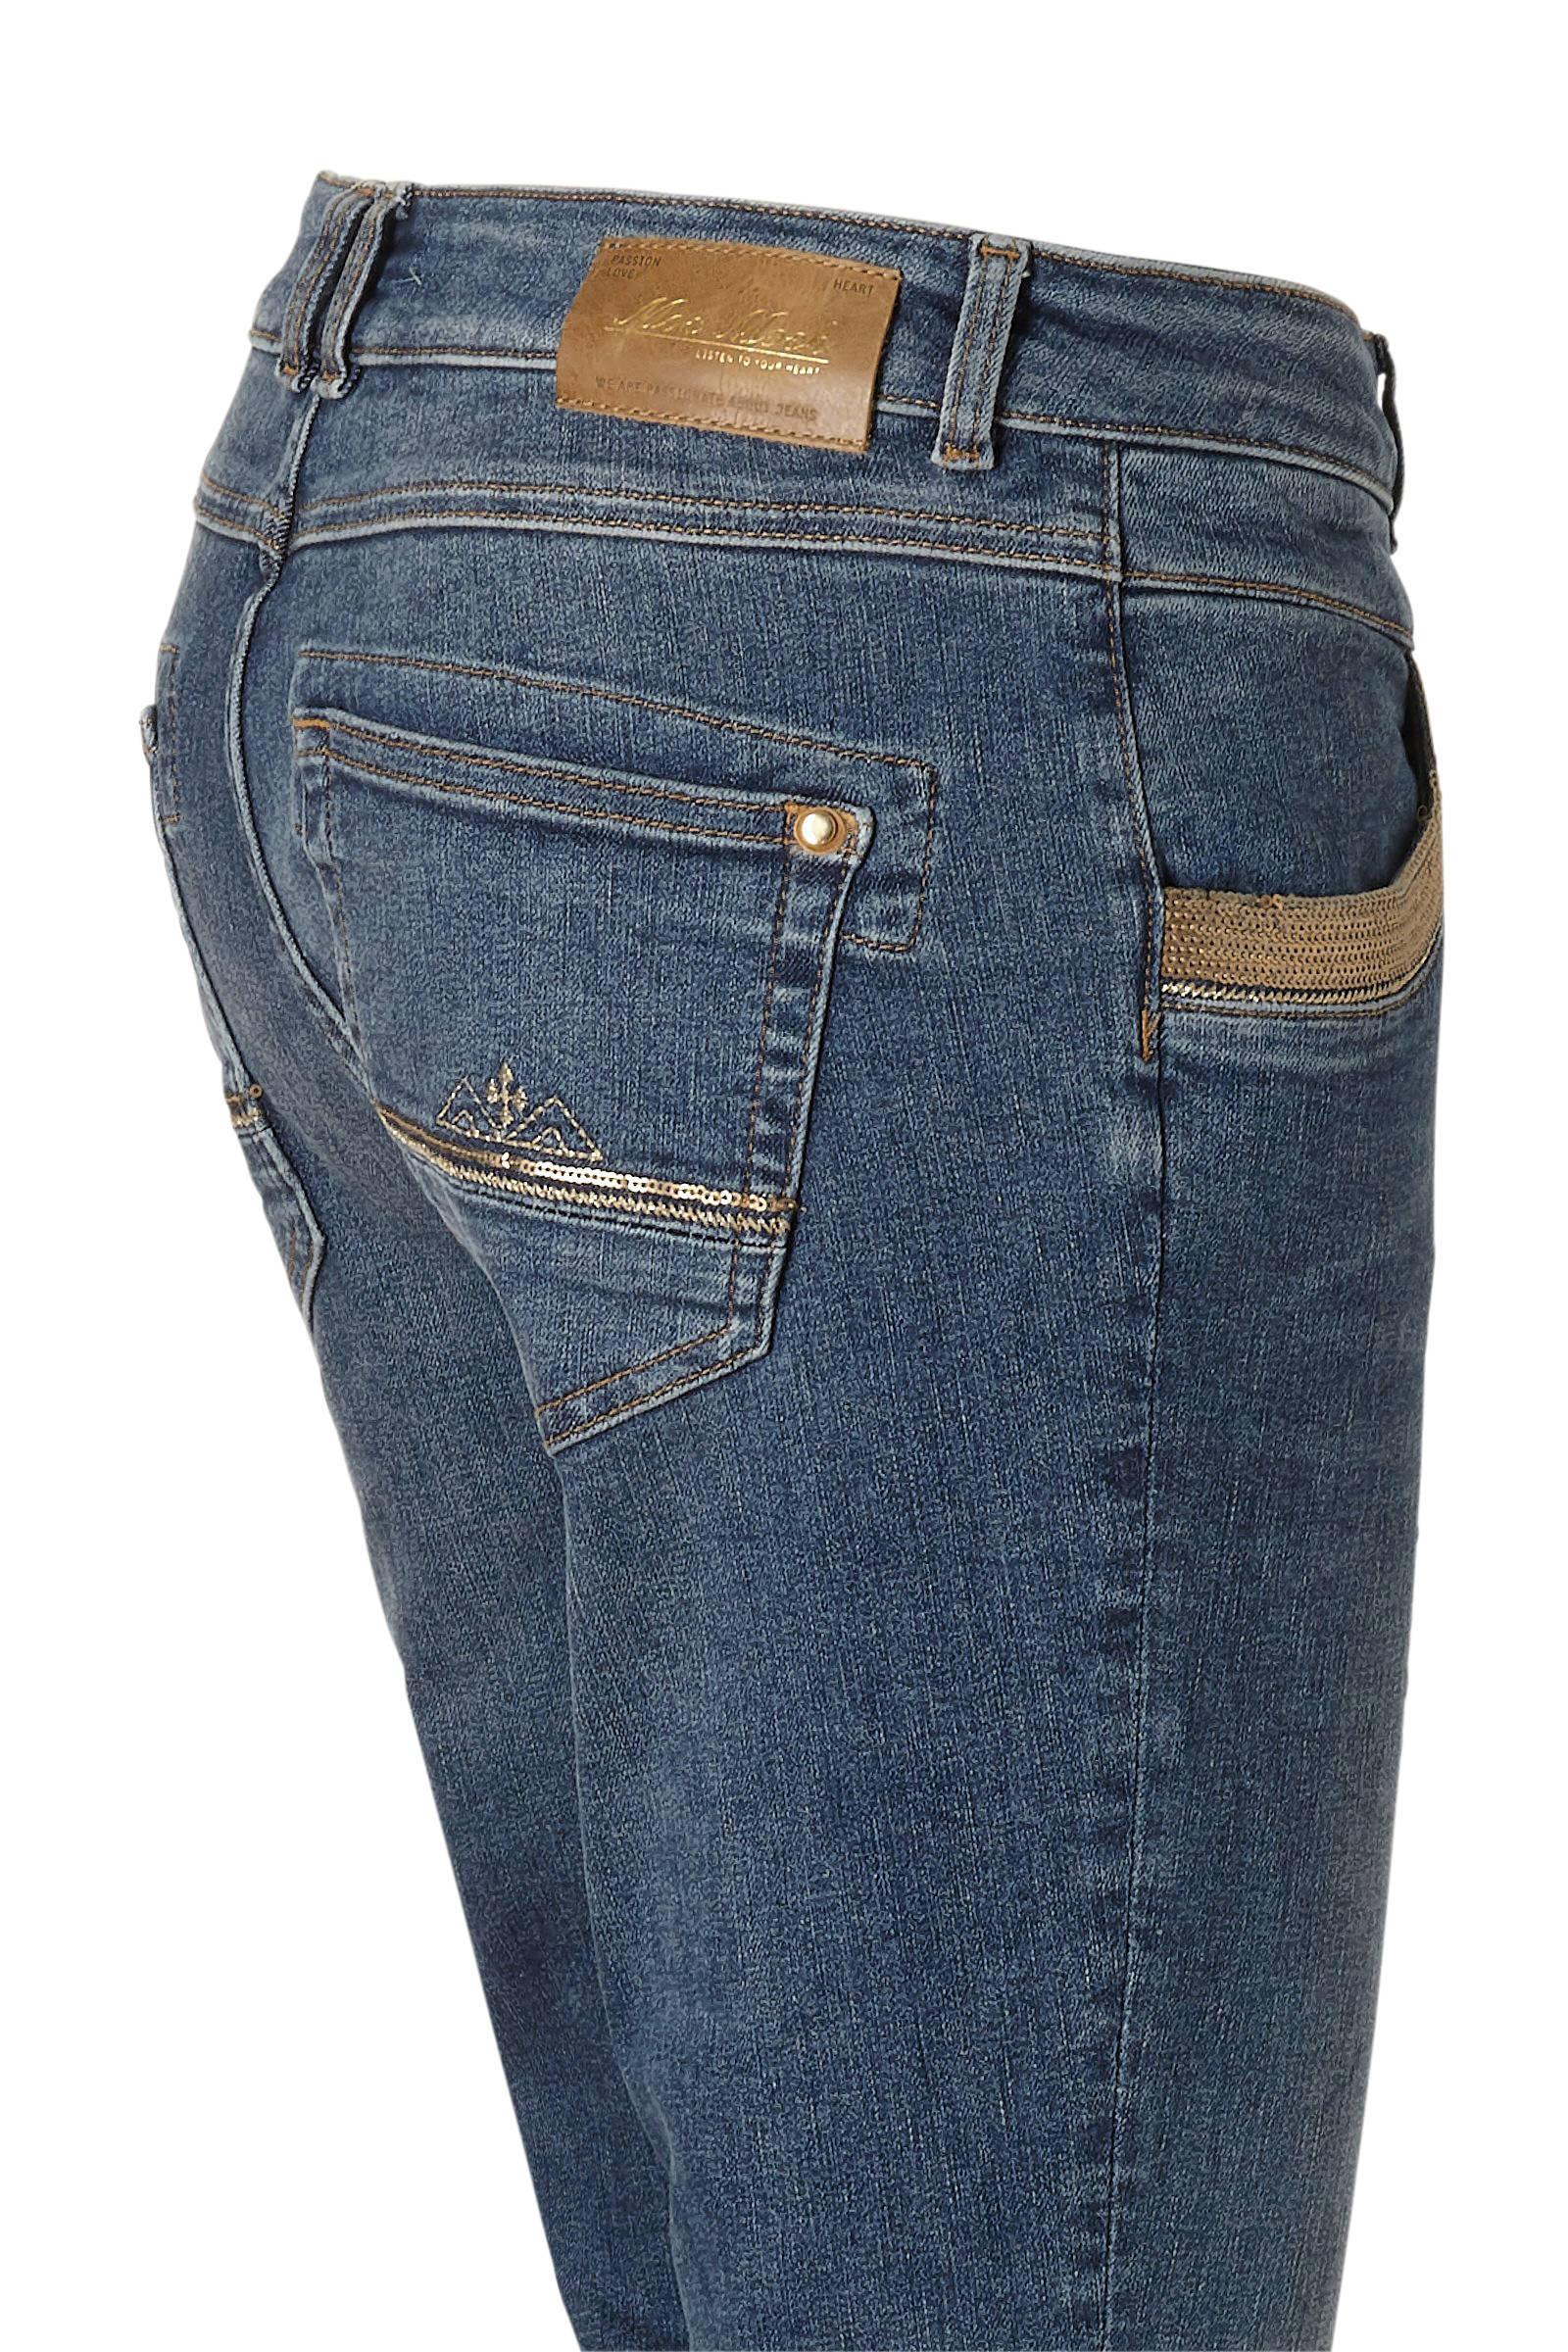 Mos Mosh regular fit jeans blue denim